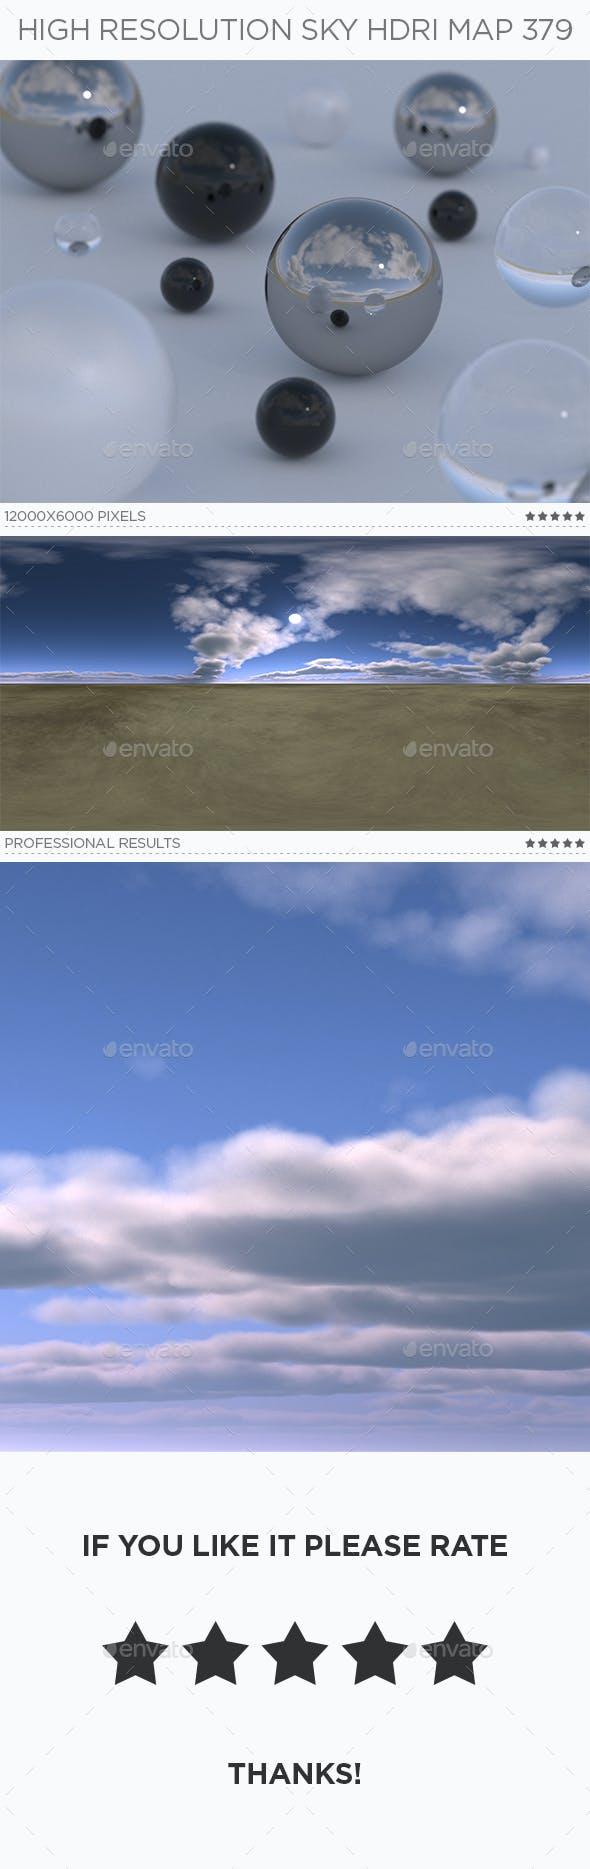 High Resolution Sky HDRi Map 379 - 3DOcean Item for Sale